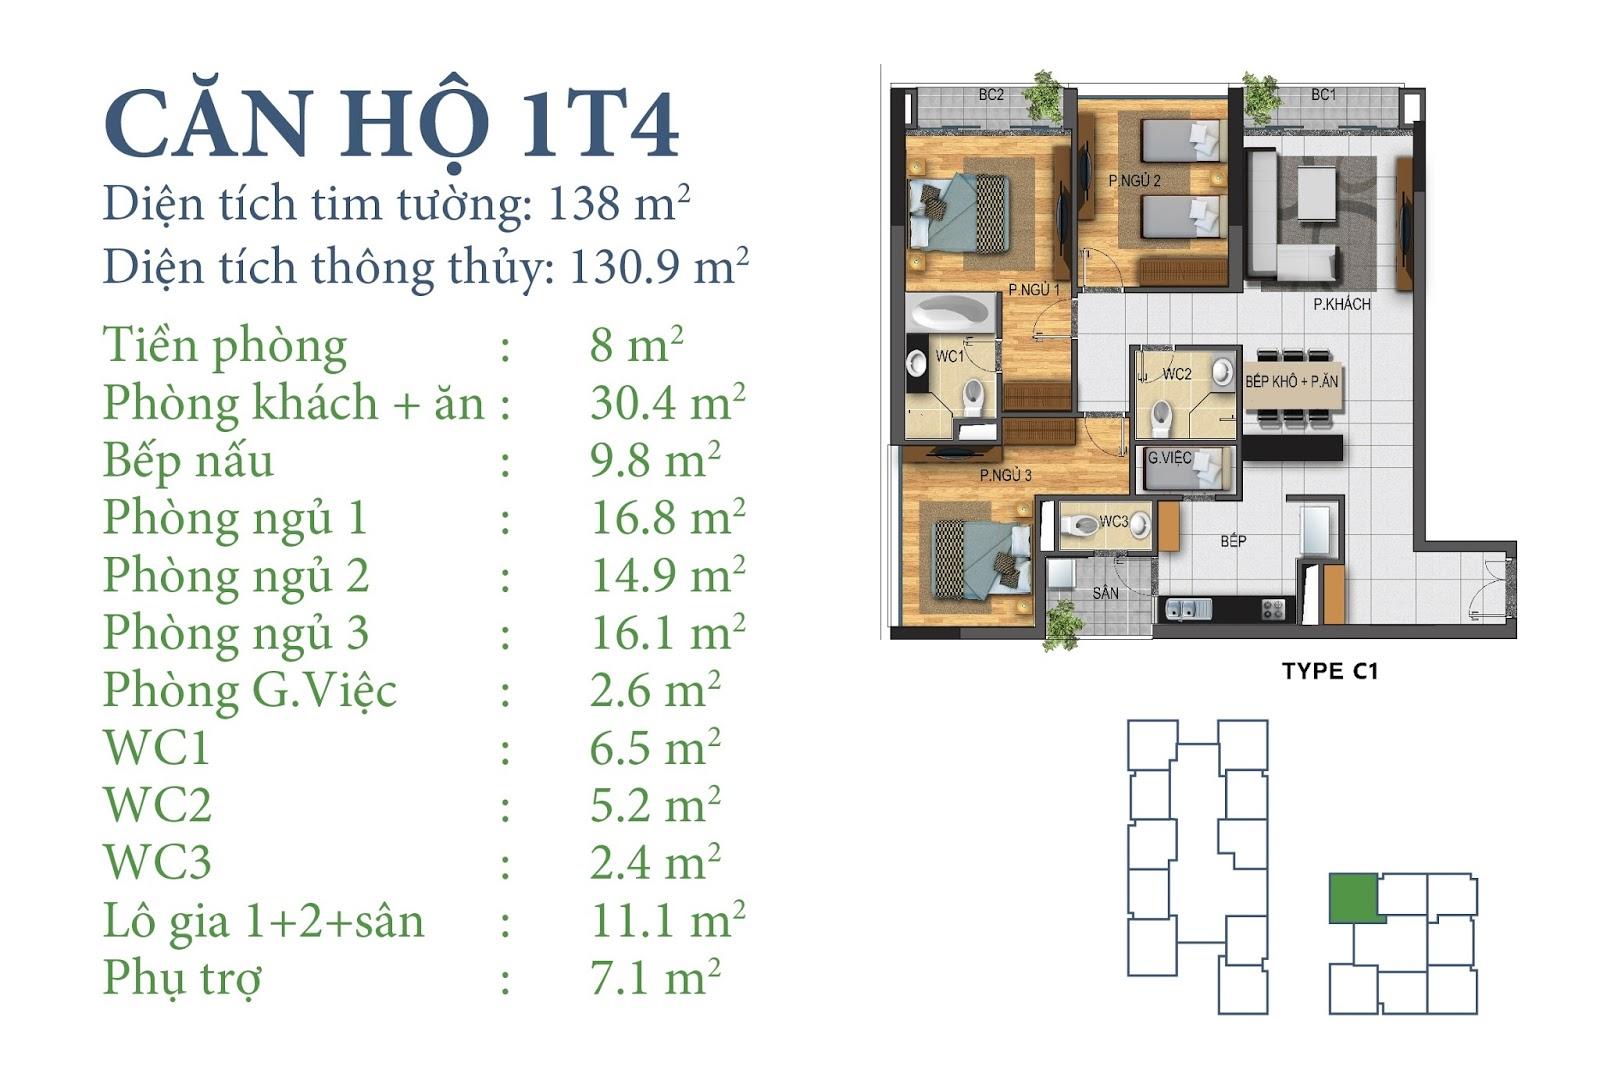 1T4-horizon-tower-ngoai-giao-doan